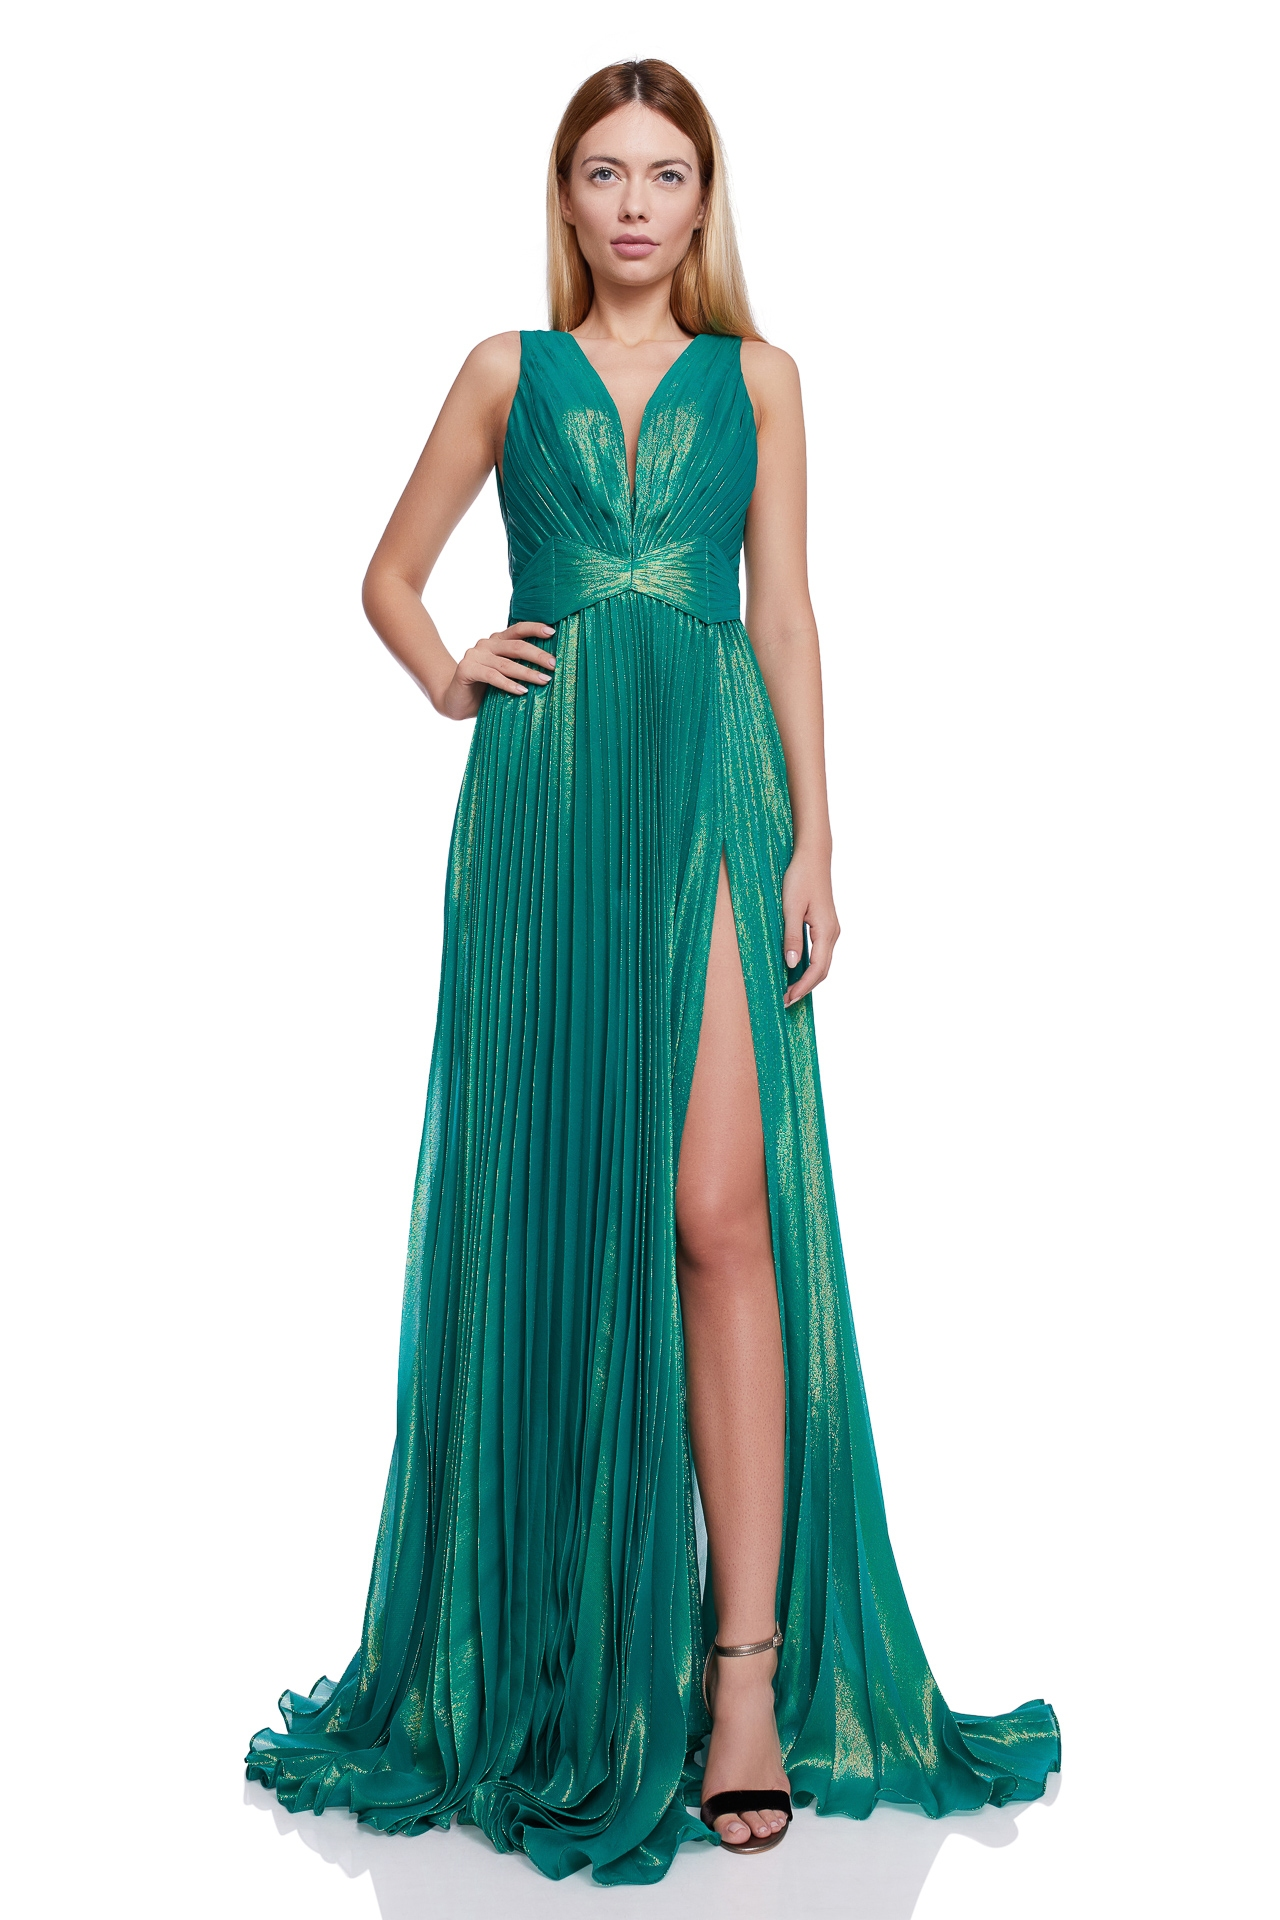 Iris-Serban-Couture-2020-4